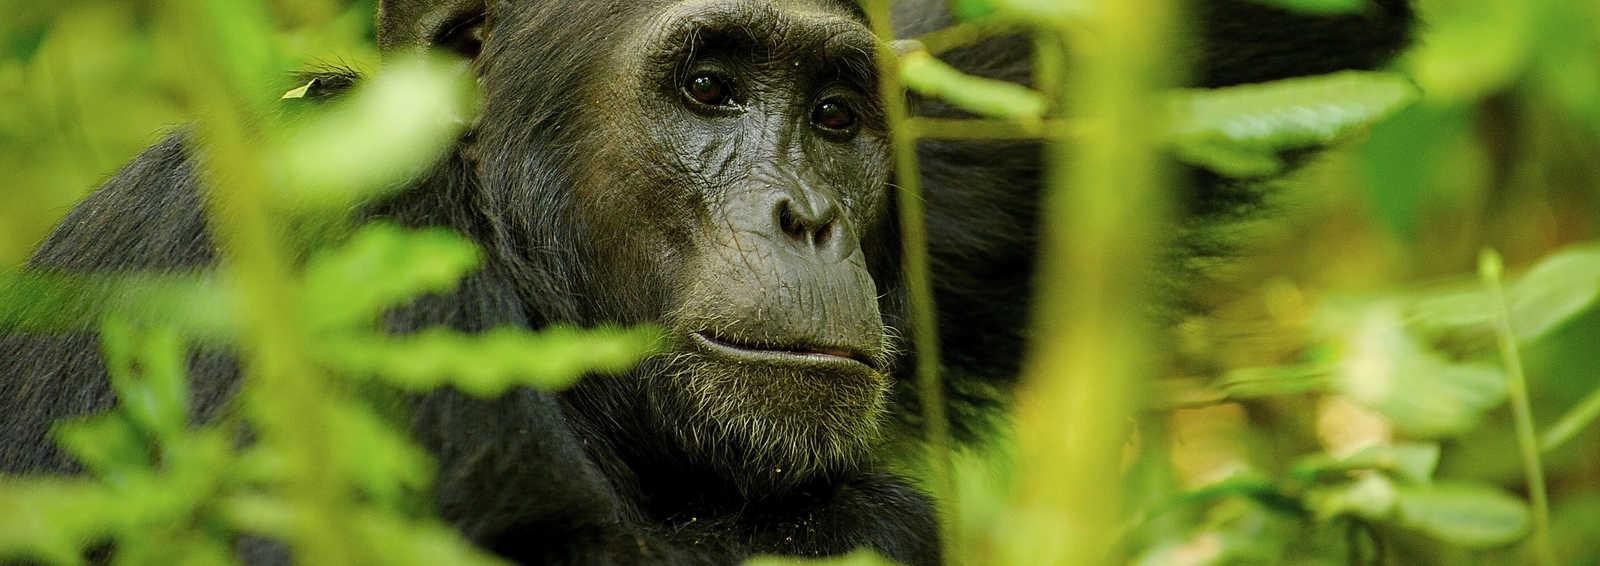 Chimpanzee in the jungle, Uganda